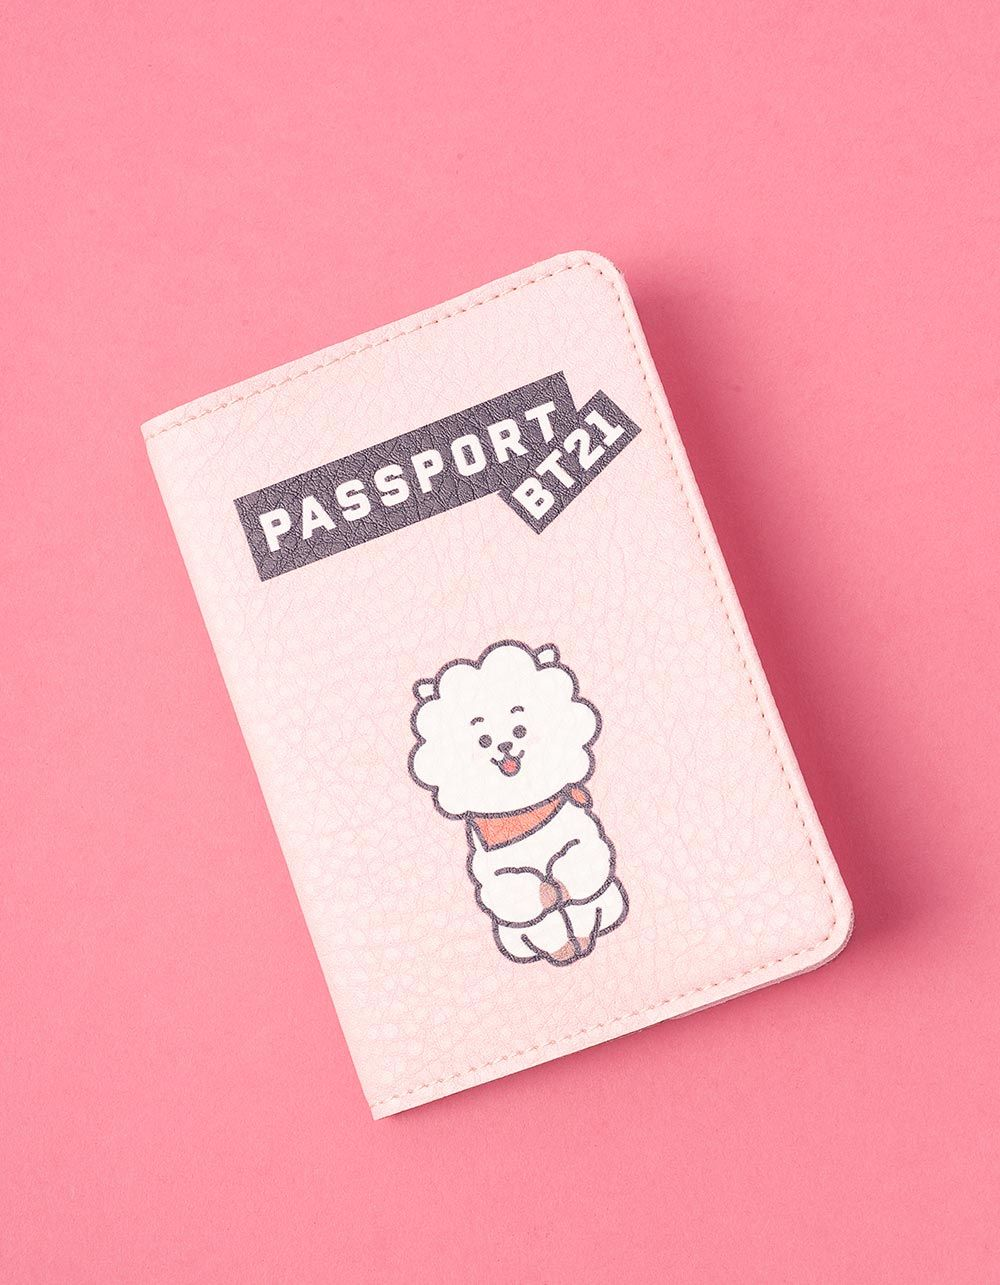 Обкладинка на паспорт з принтом RJ  Джин bts bt21 | 237246-14-XX